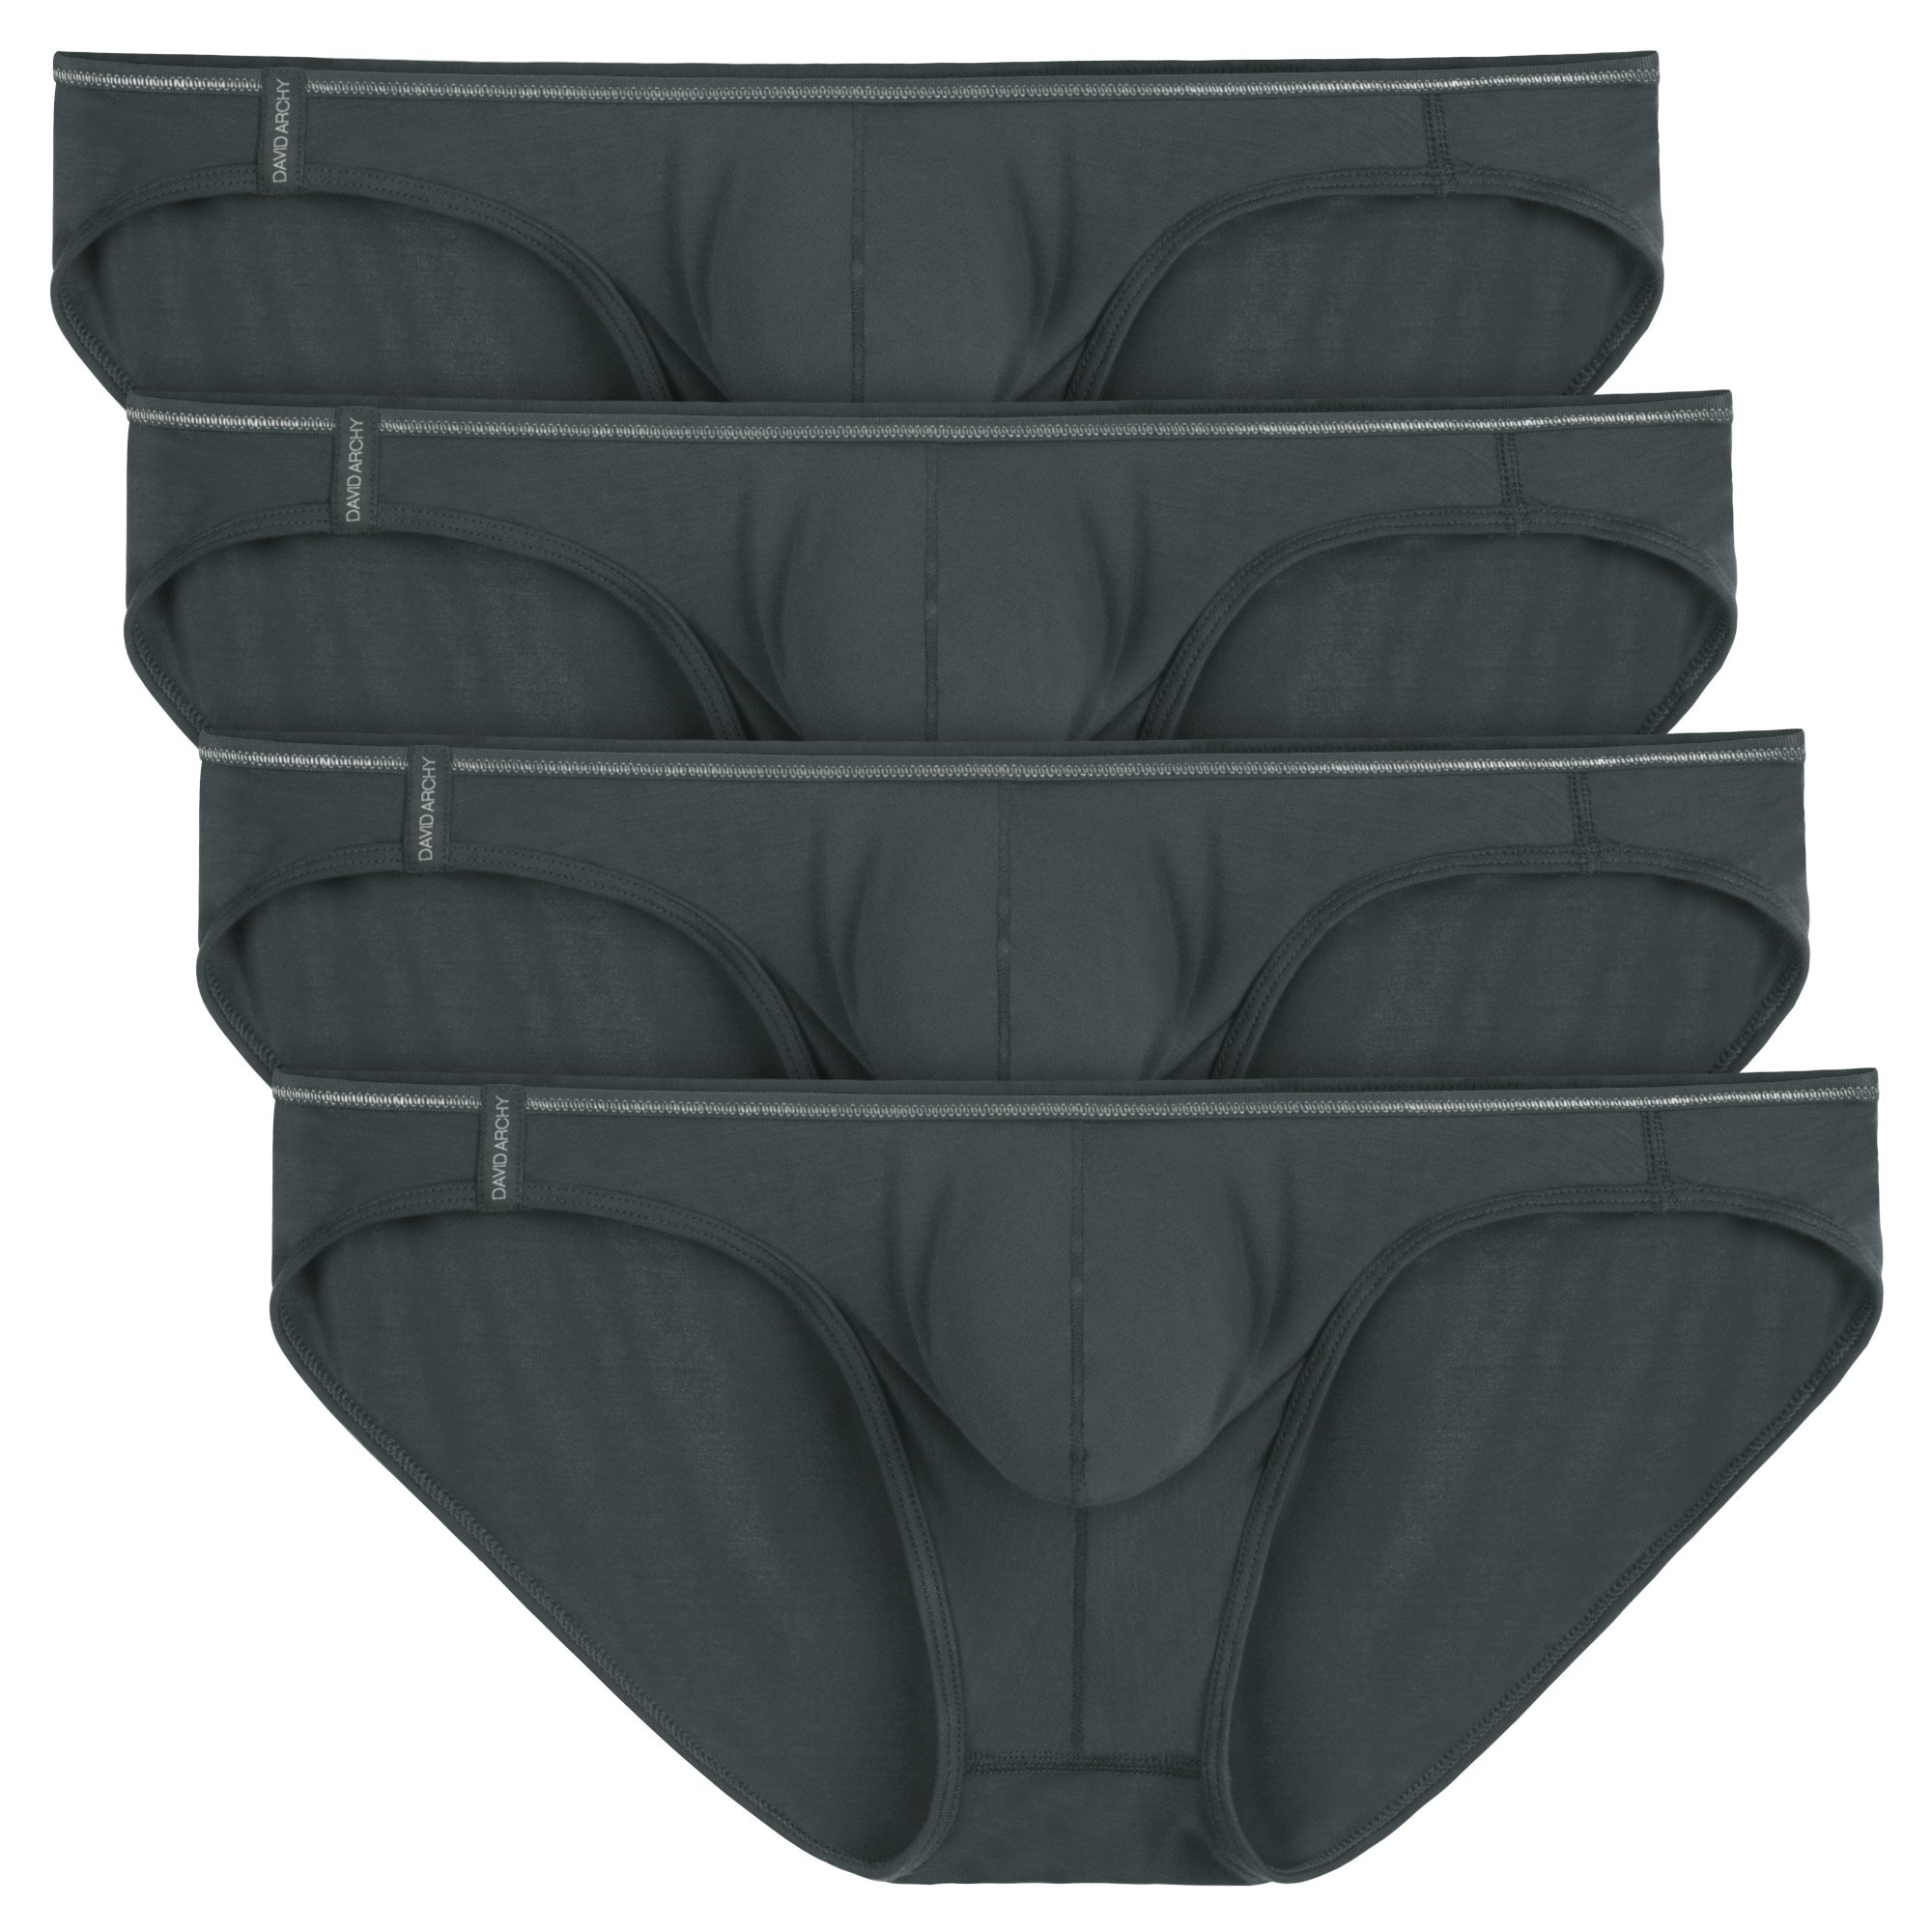 David Archy Men's 4 Pack Micromodal Air Sexy Bikinis and Briefs (M, Dark Gray)